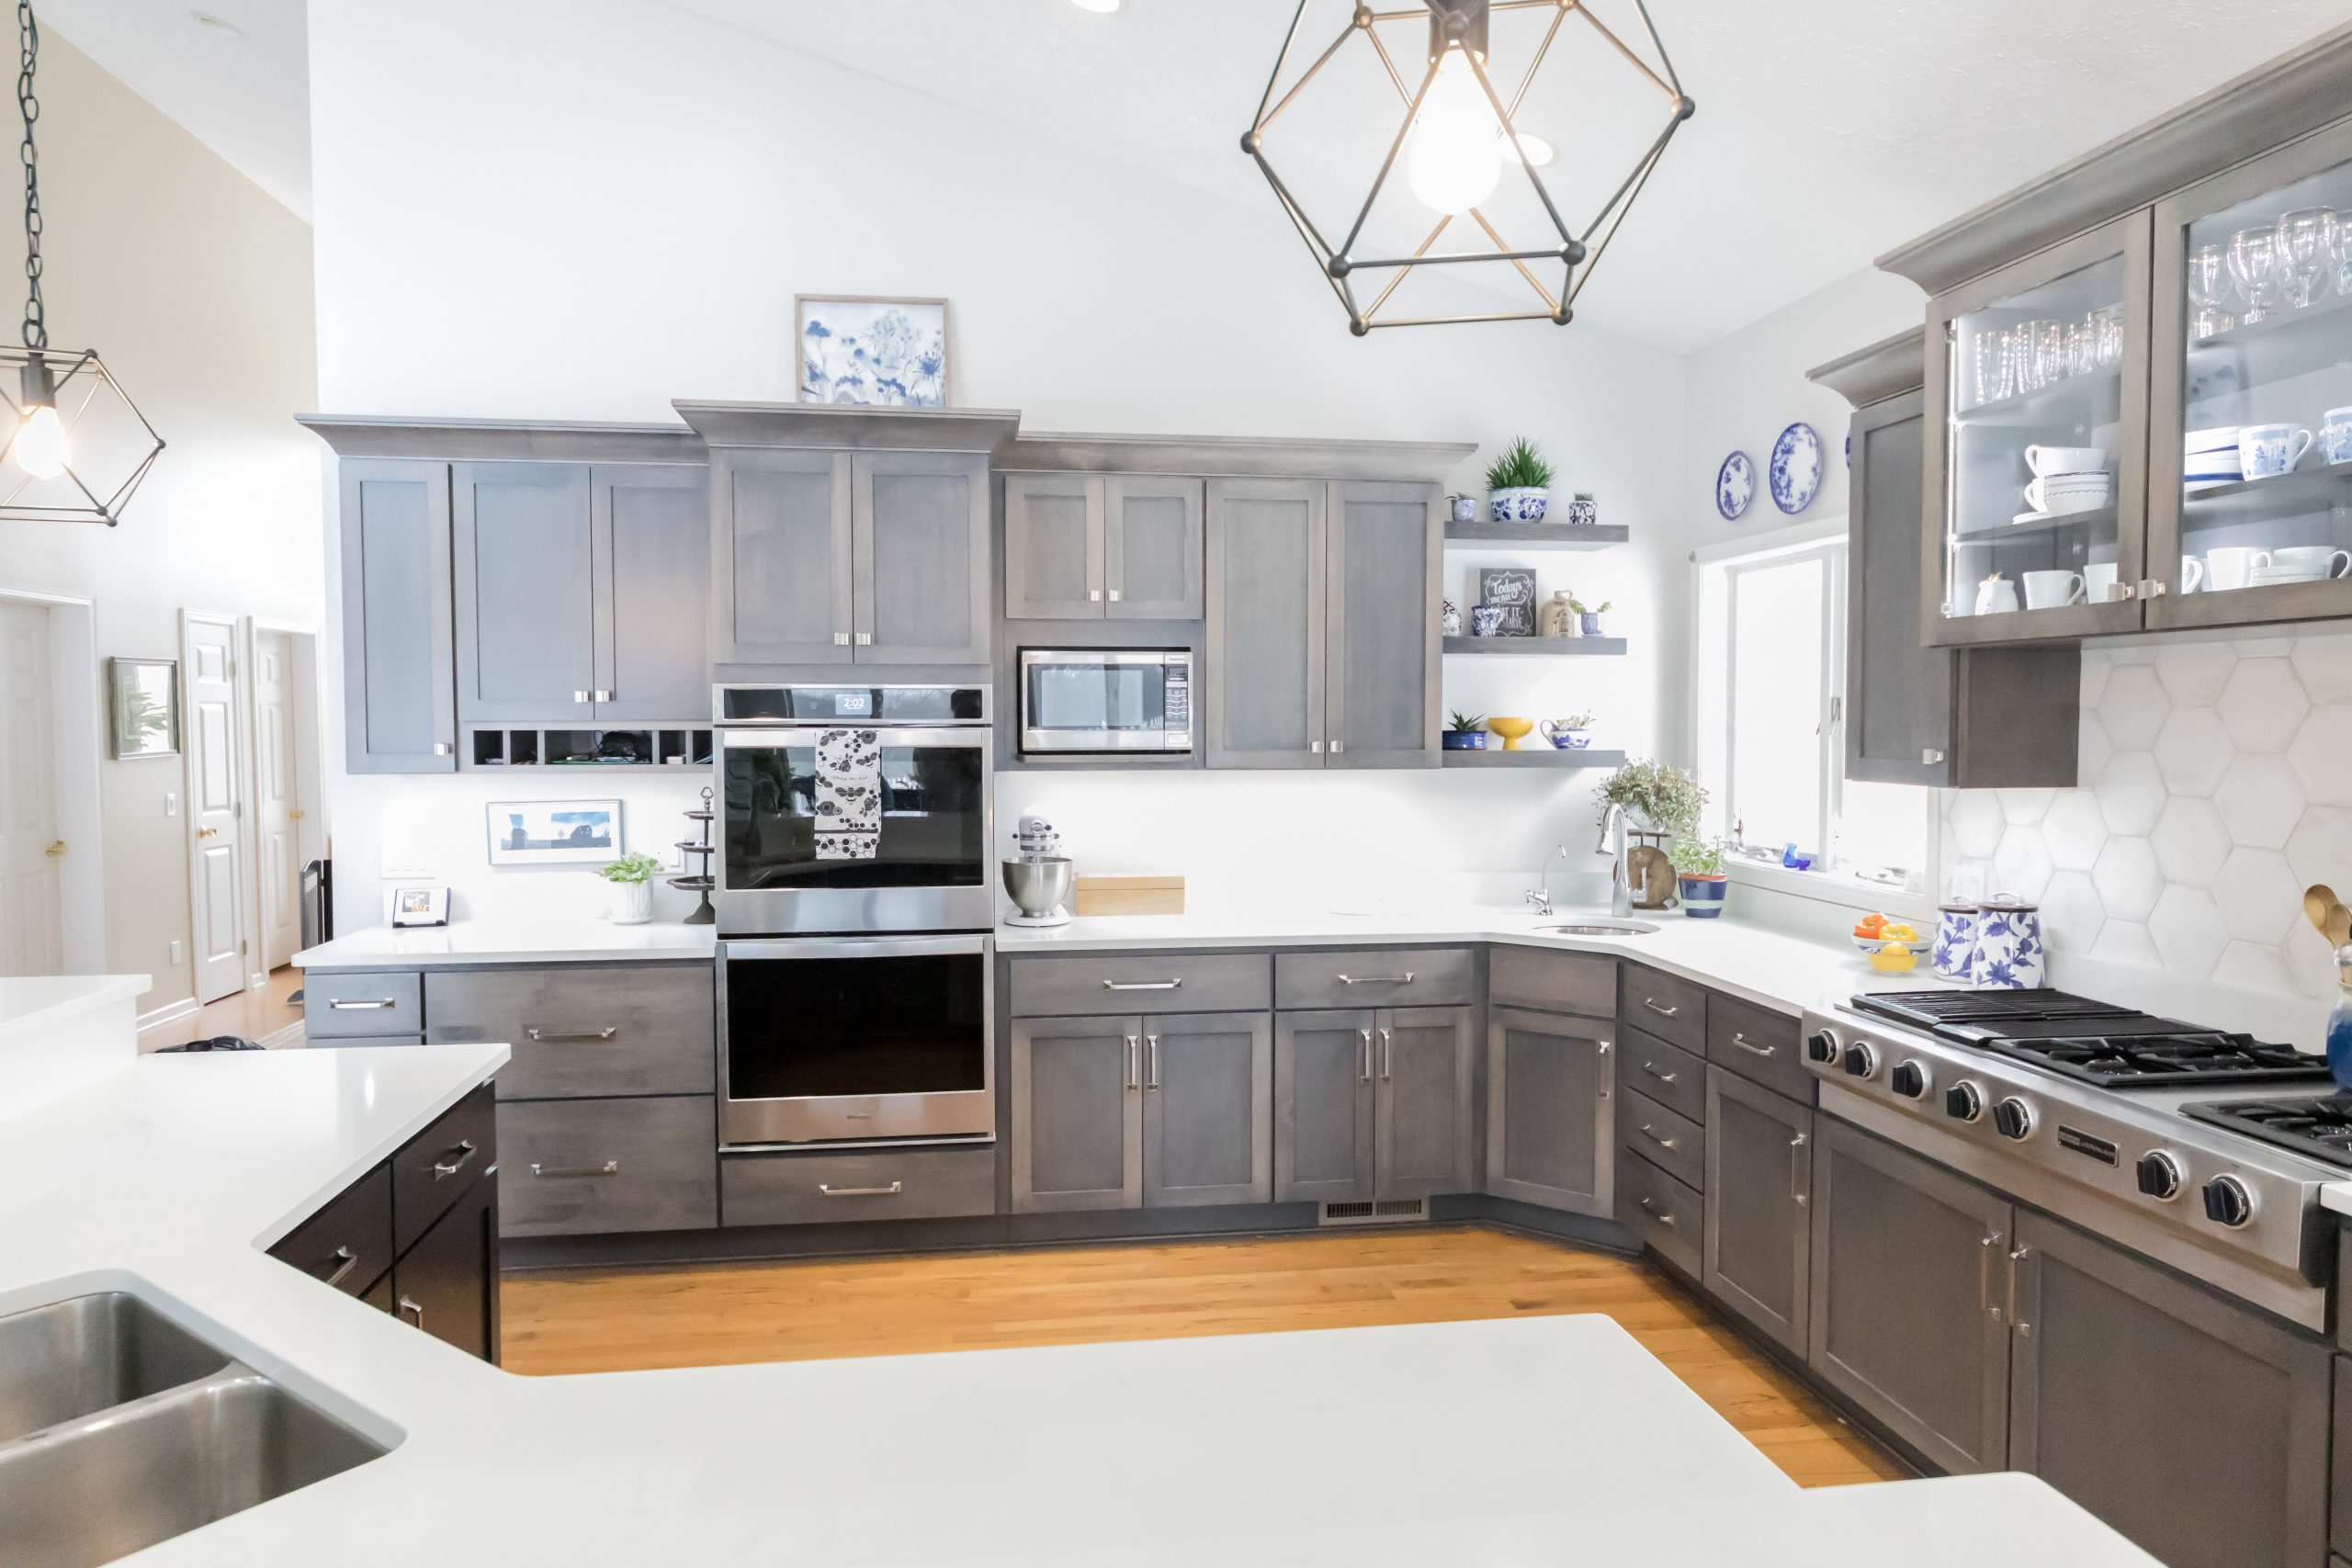 Custom Kitchen Remodel in West Michigan